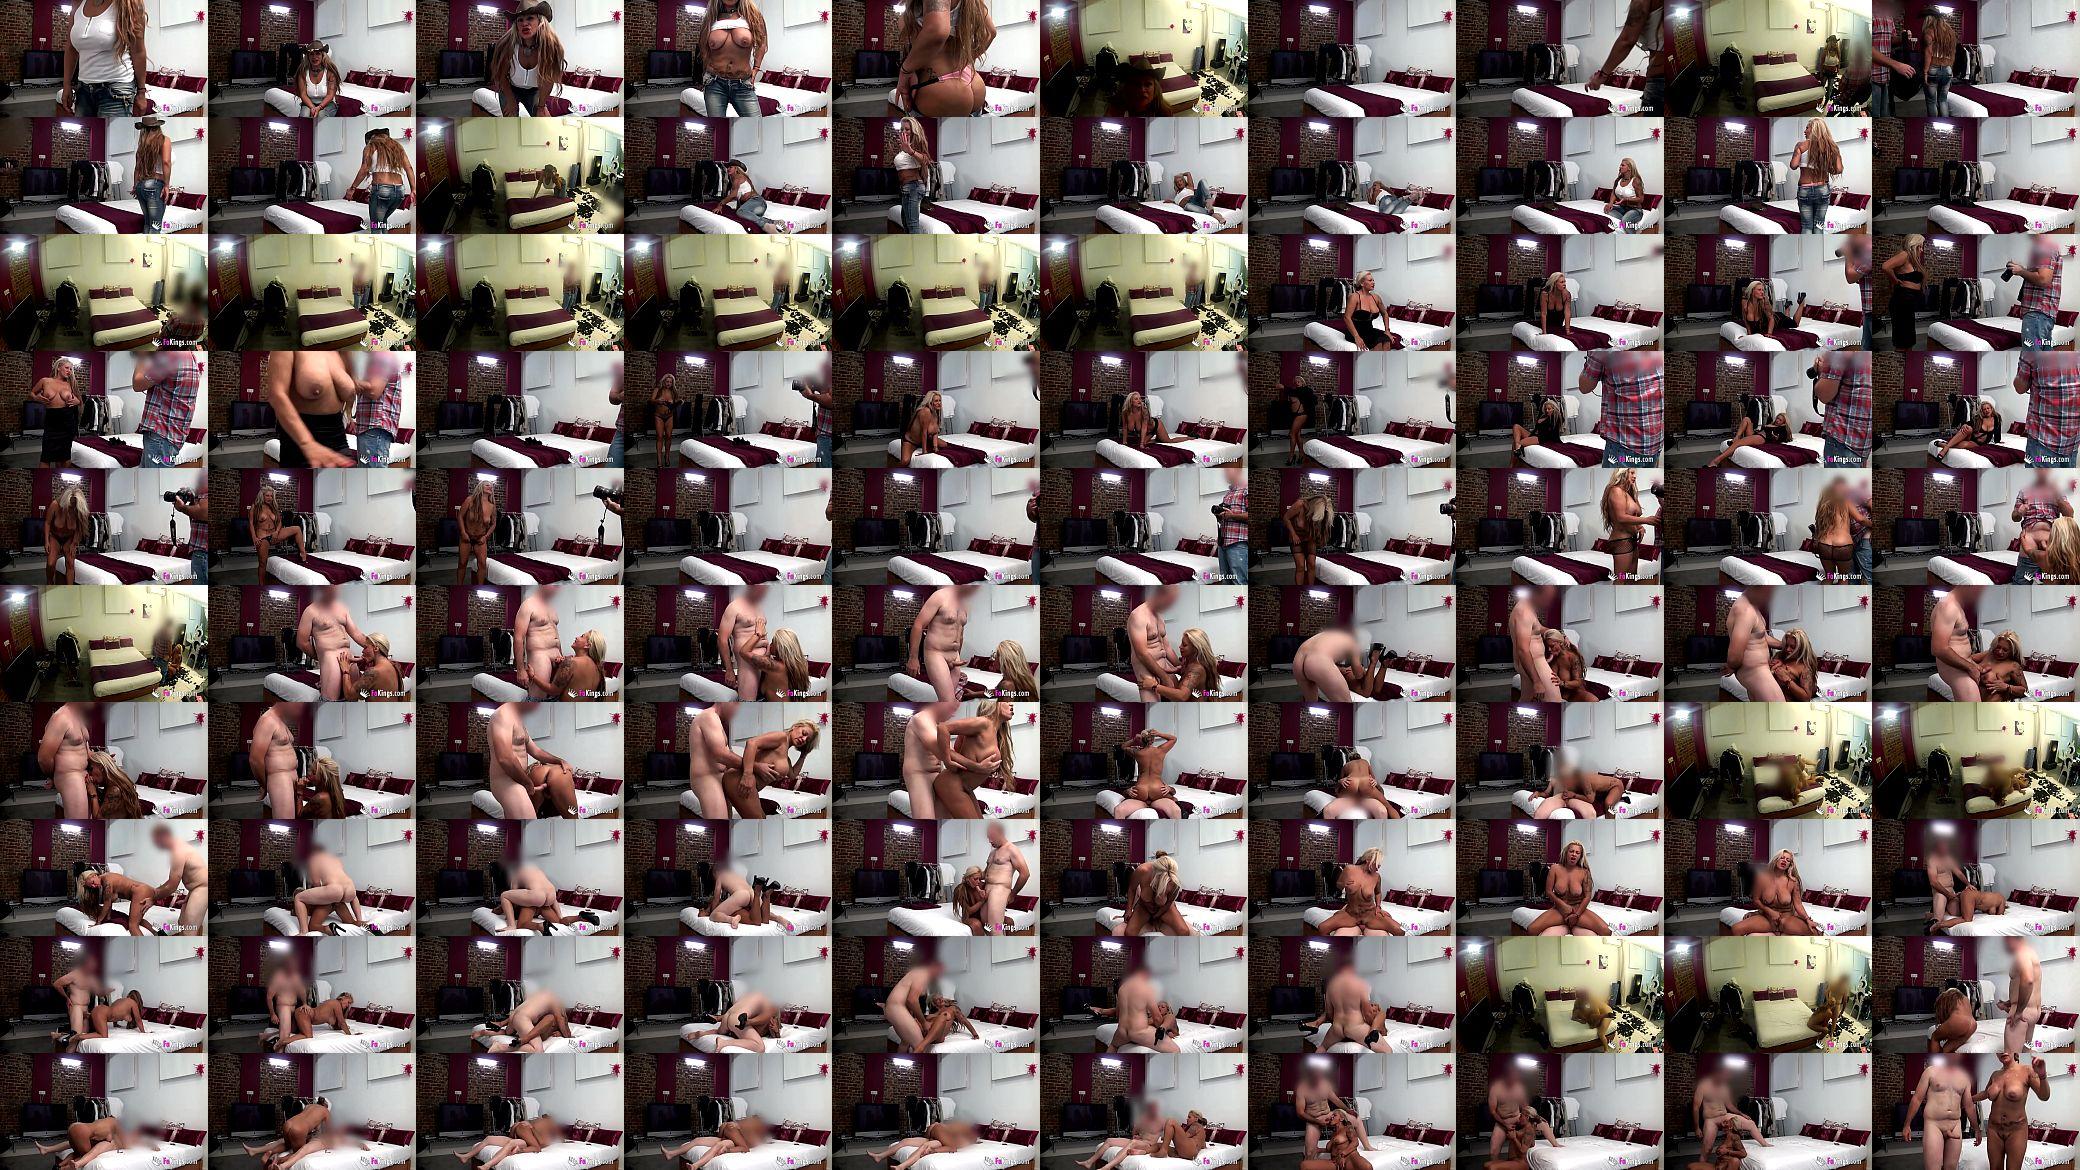 Alexa Blum Videos Porno 45yo incredibly hot milf alexa blune wants to fuck her best